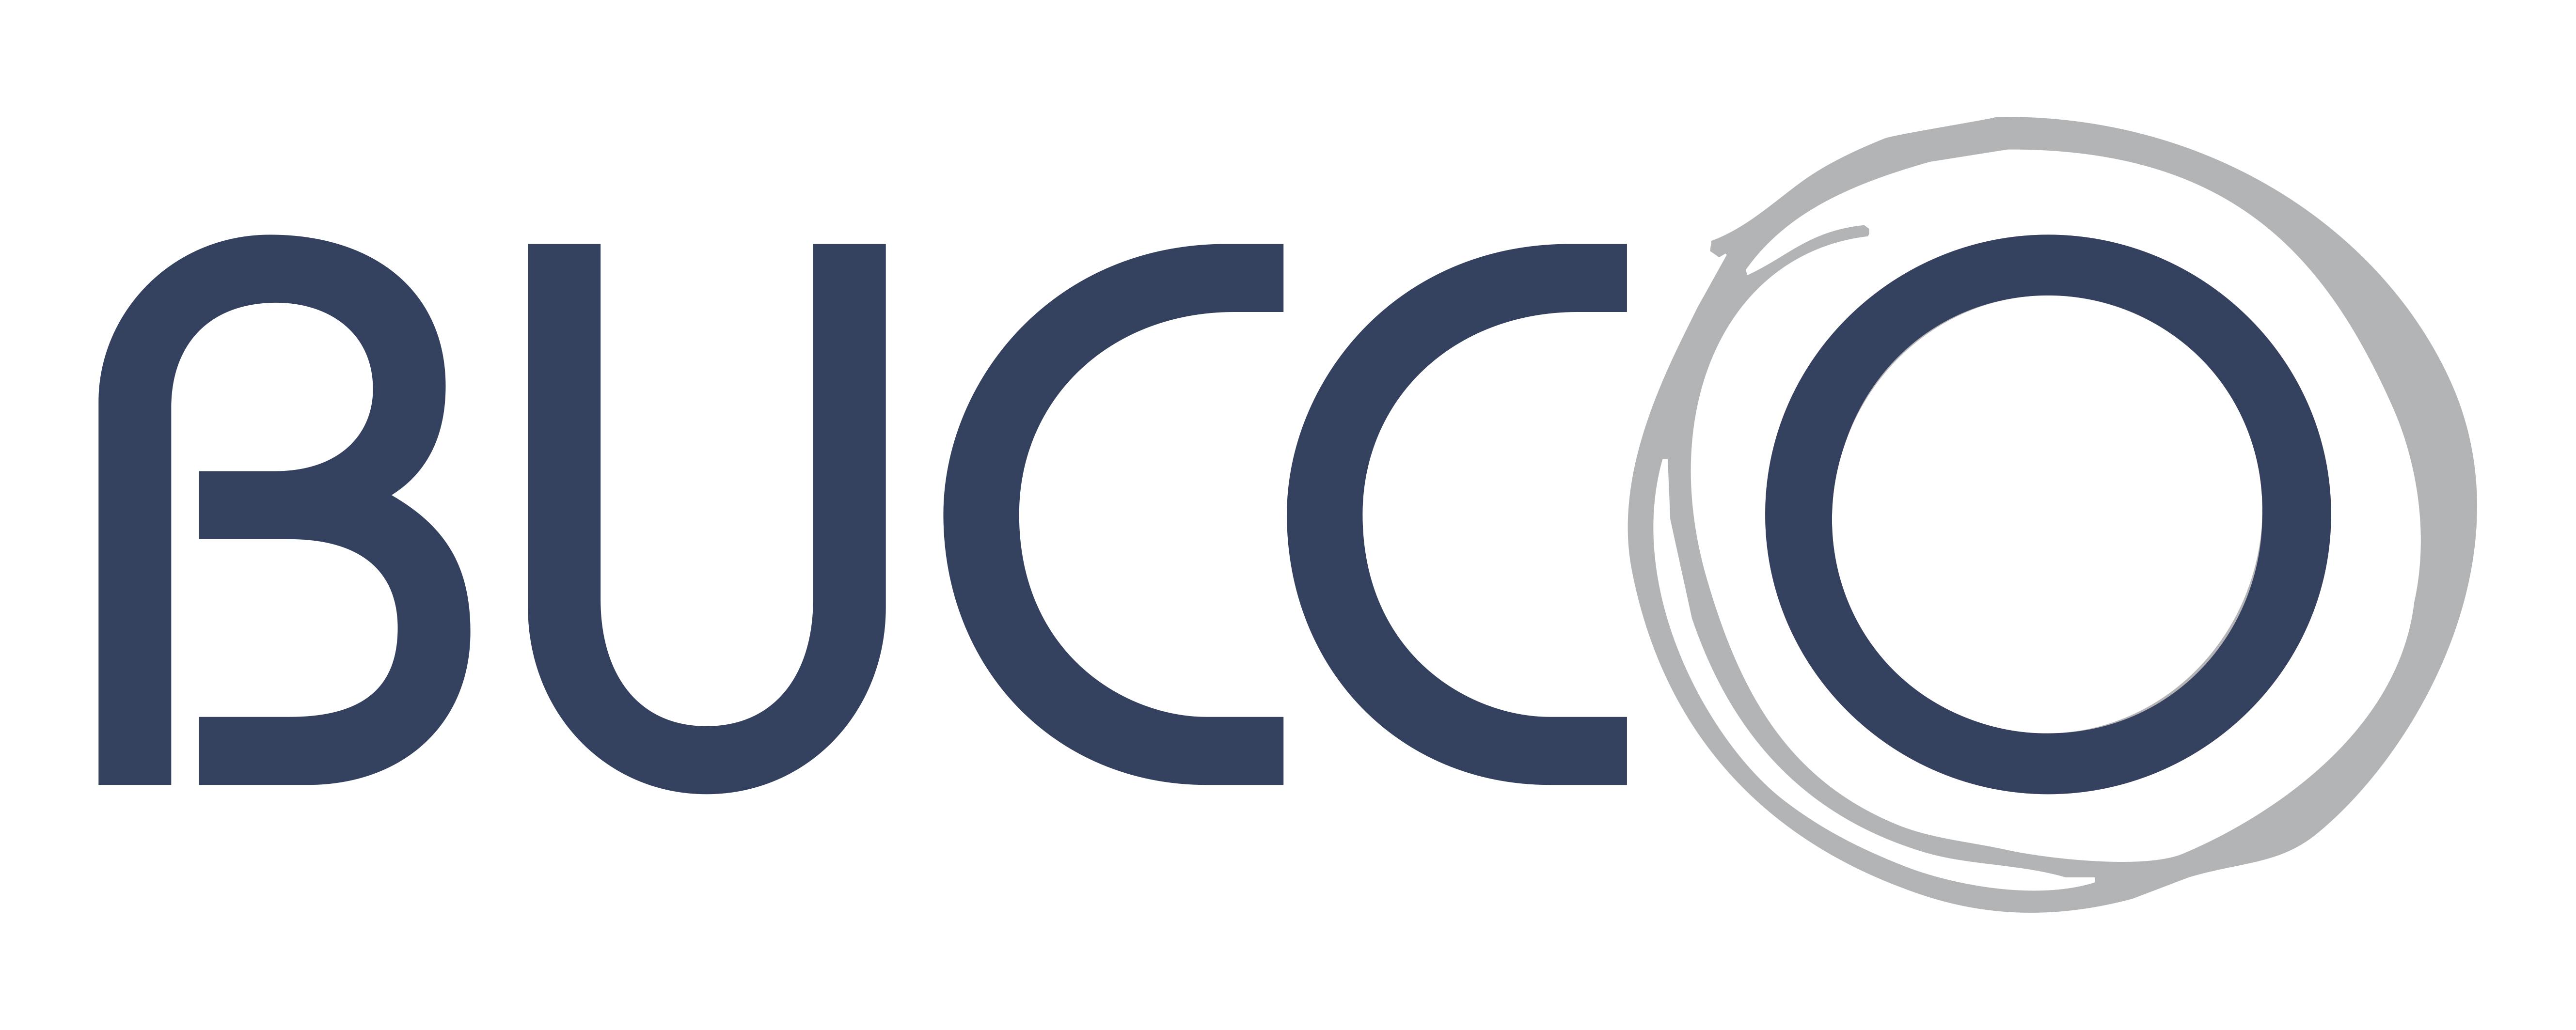 BUCCO-LOGO